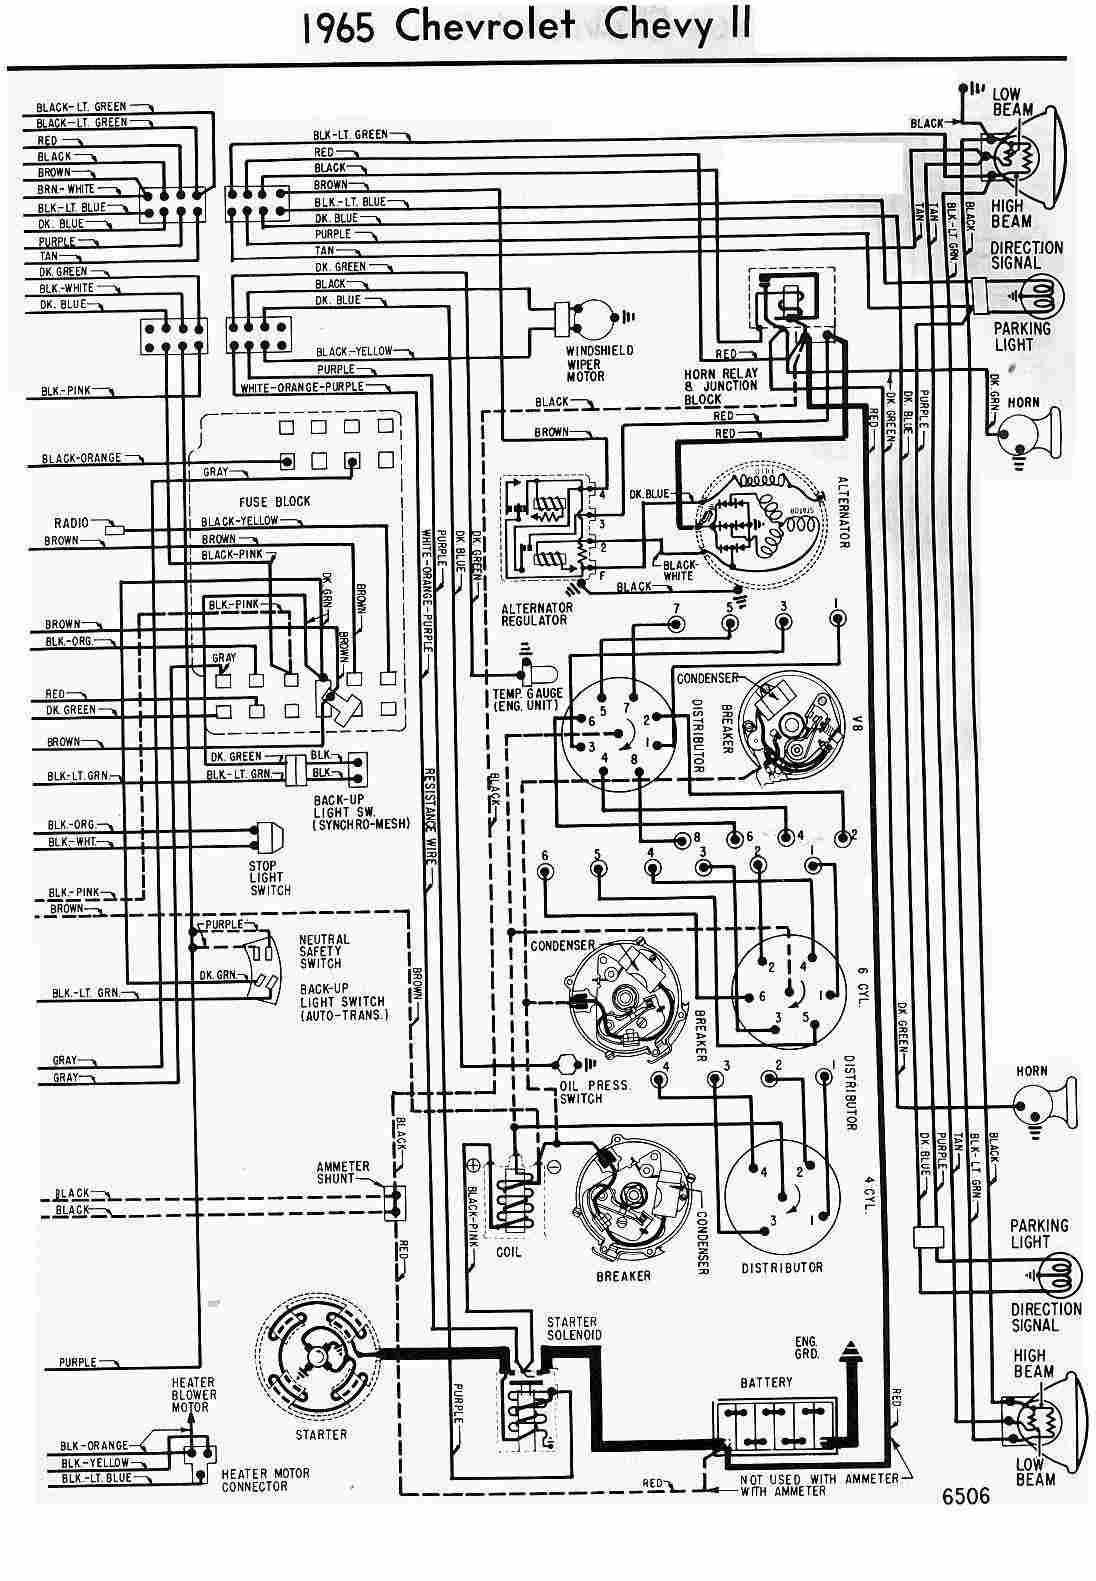 Chevrolet Chevy 4 Wire Alternator Wiring Diagram : chevrolet, chevy, alternator, wiring, diagram, Chevy, Charging, Wiring, Diagram, Export, Split-momentum, Split-momentum.congressosifo2018.it